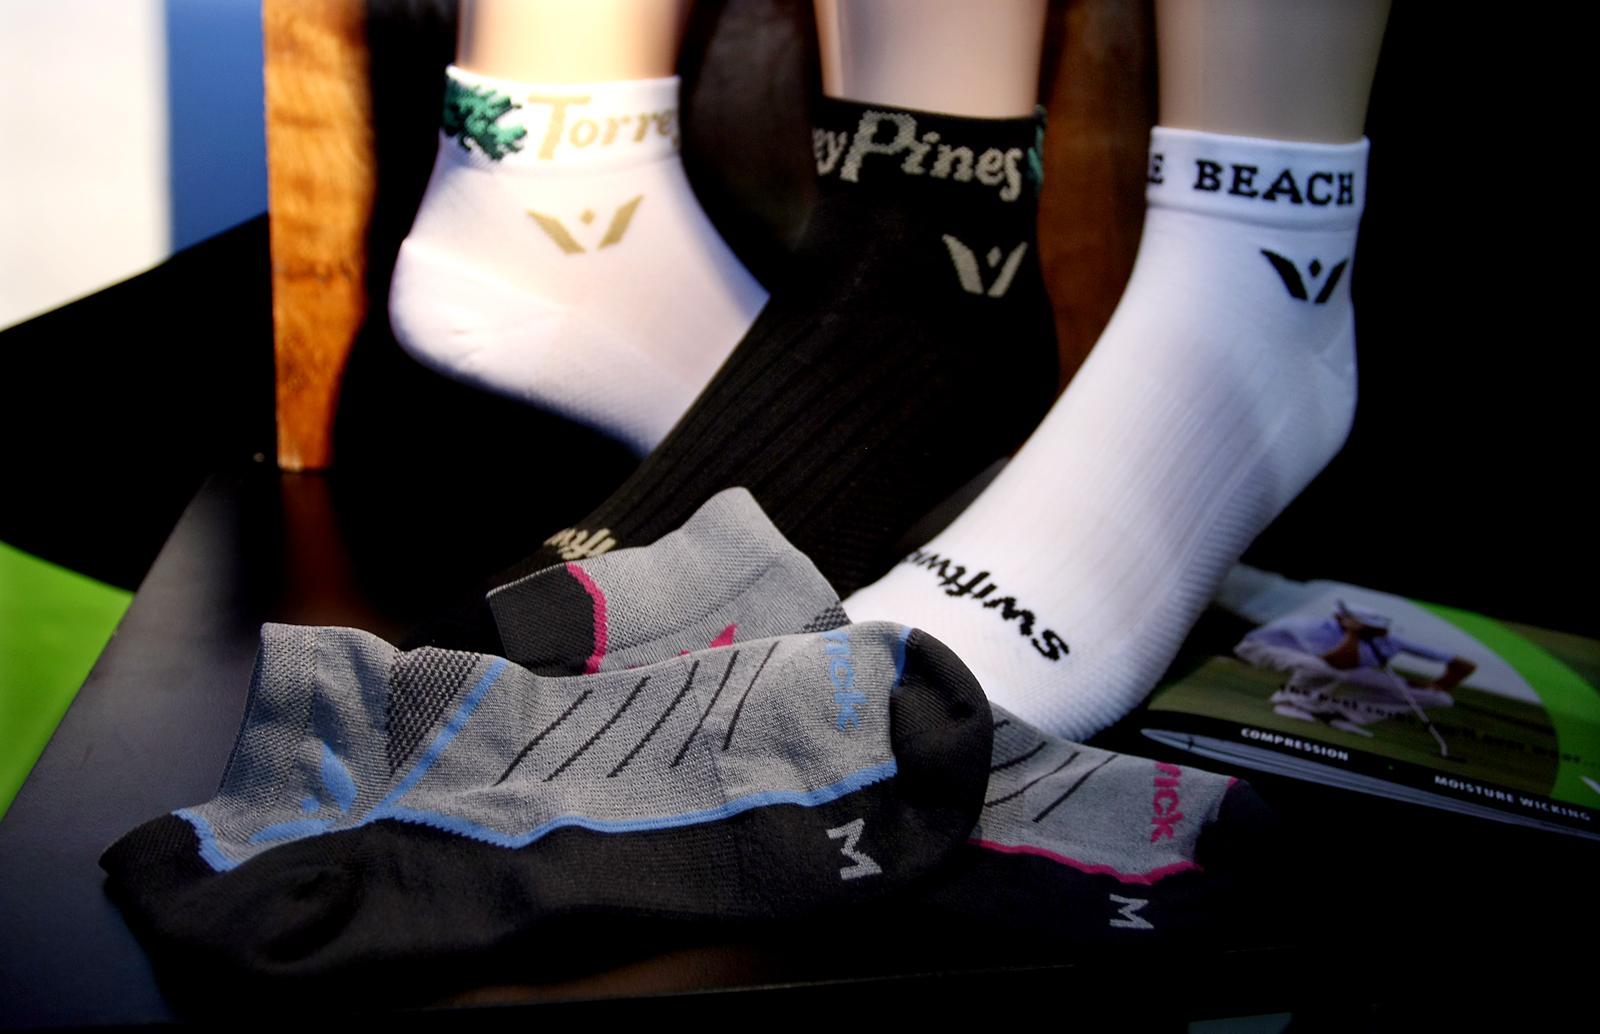 Swiftwick socks on display at the PGA Merchandise Show.